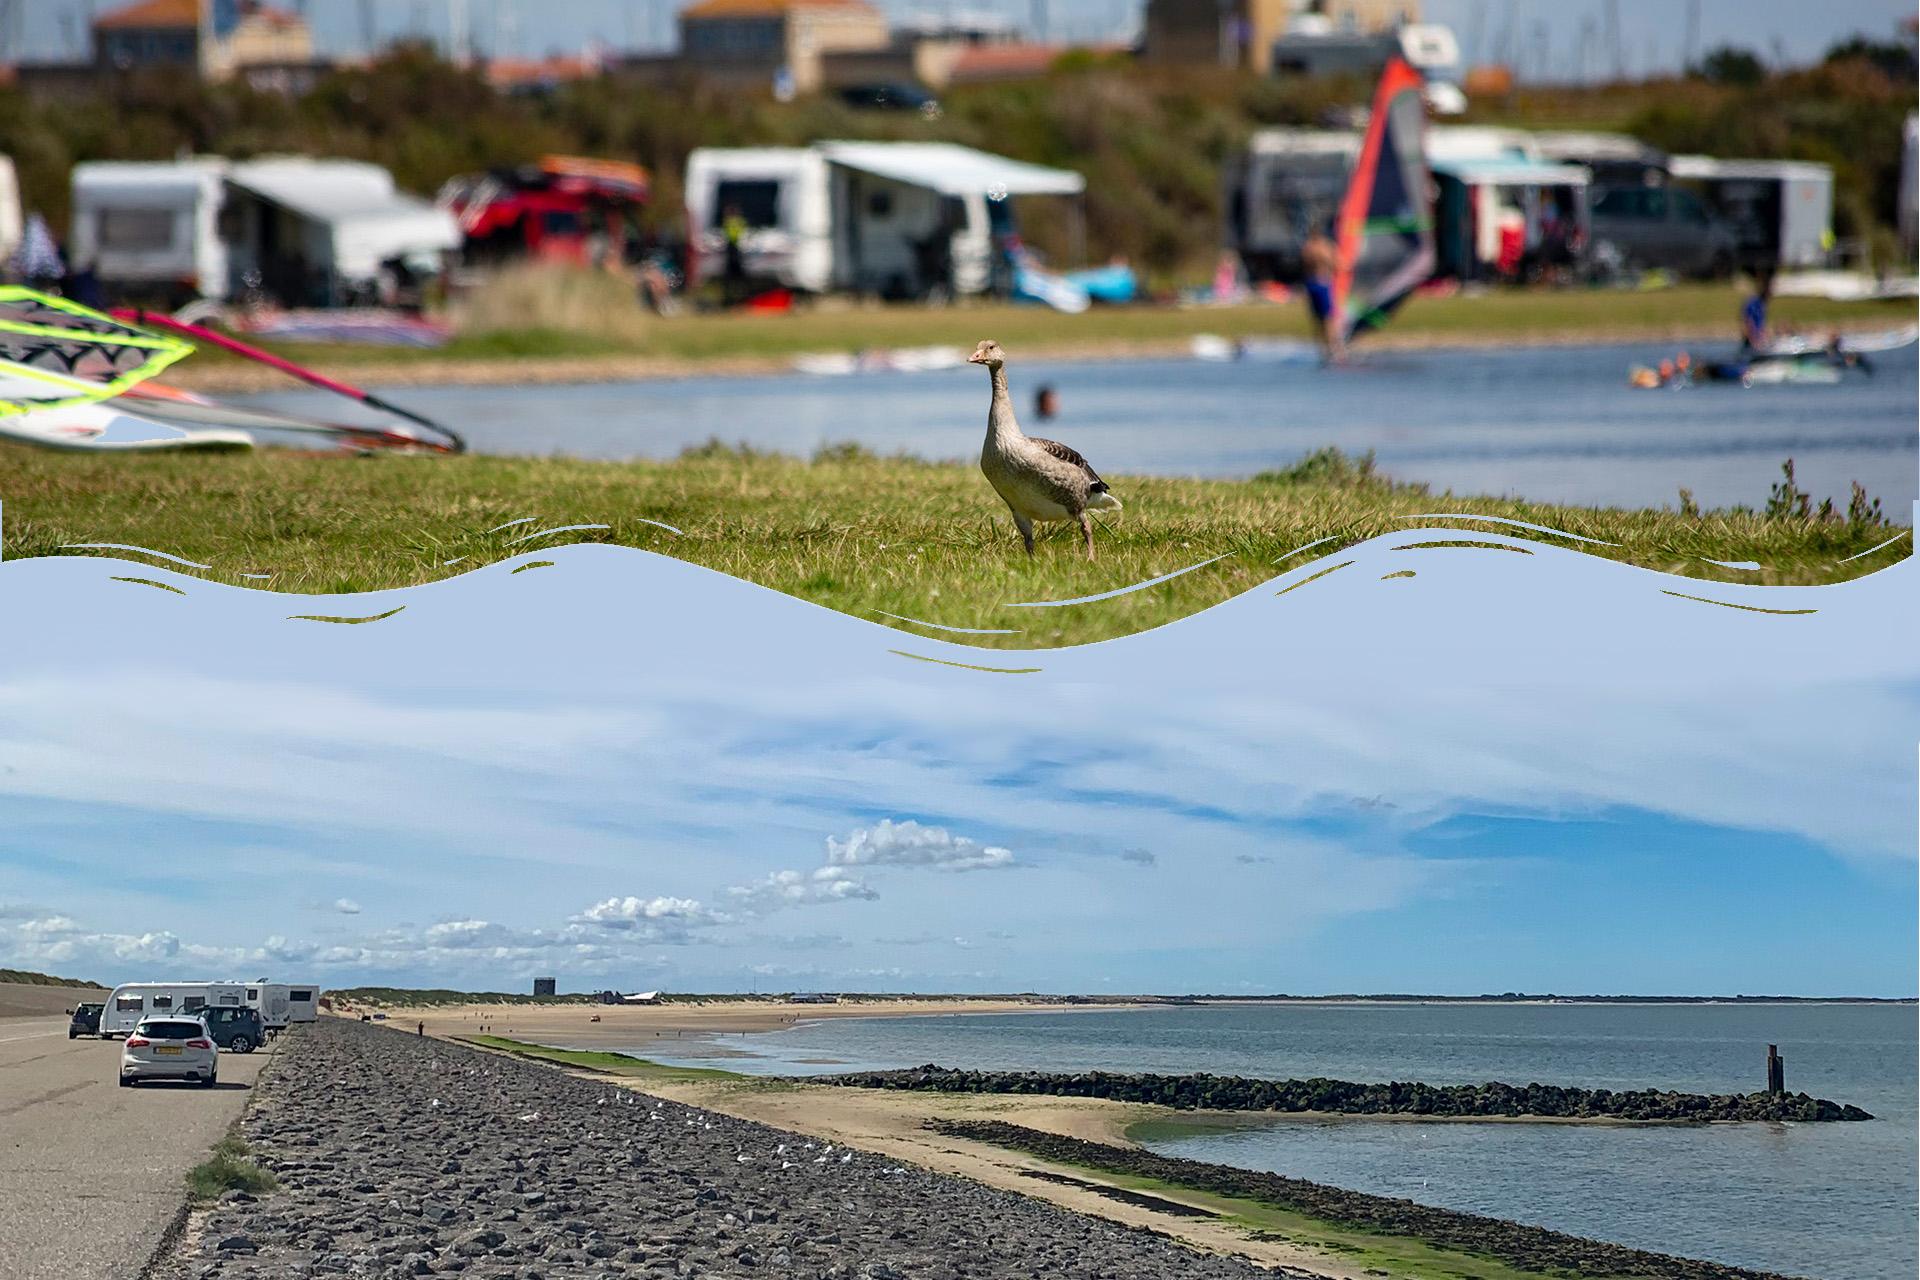 Strandbesuch: Surf-Happening am Brouwersdam, NL